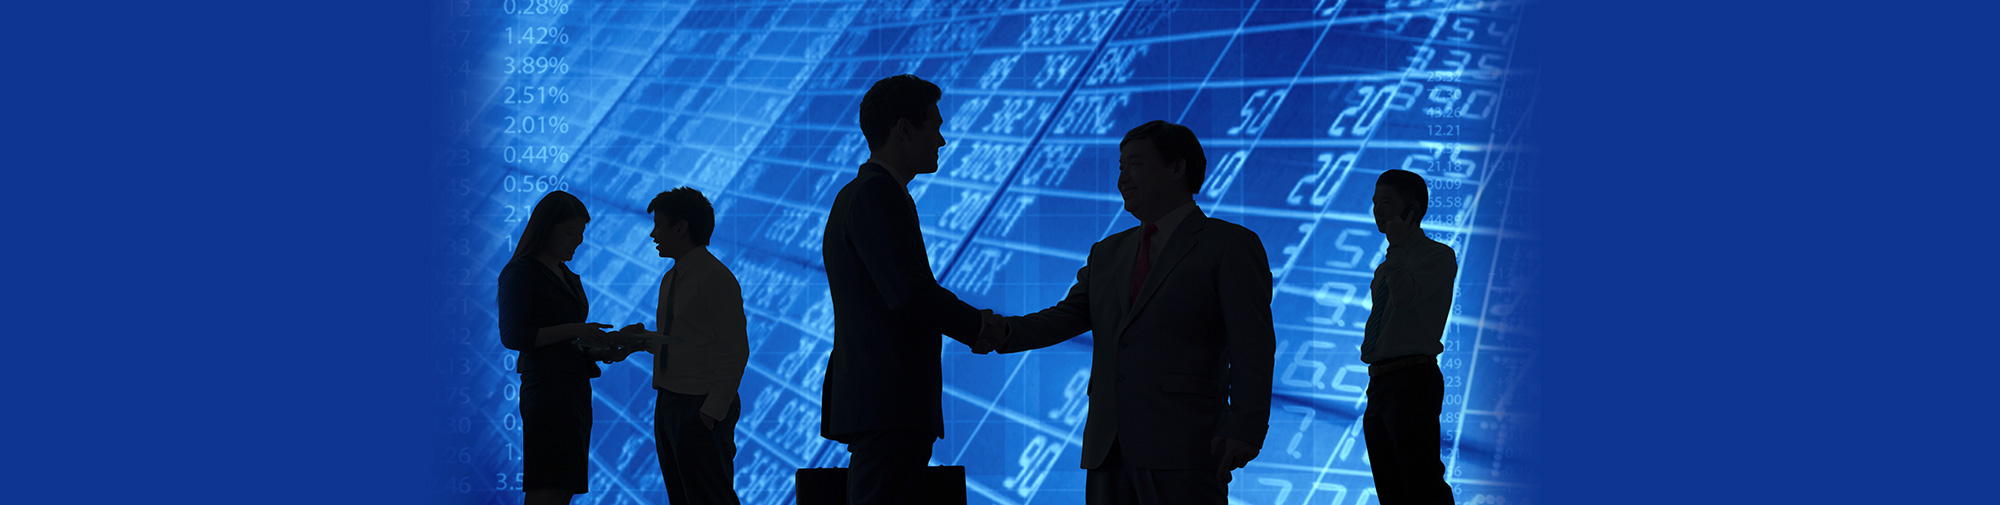 http://www.gekterna.com/userfiles/11e3ebfa-92f9-4083-8c5b-a26d00fe9b3c/Investor_Relations2_1.jpg